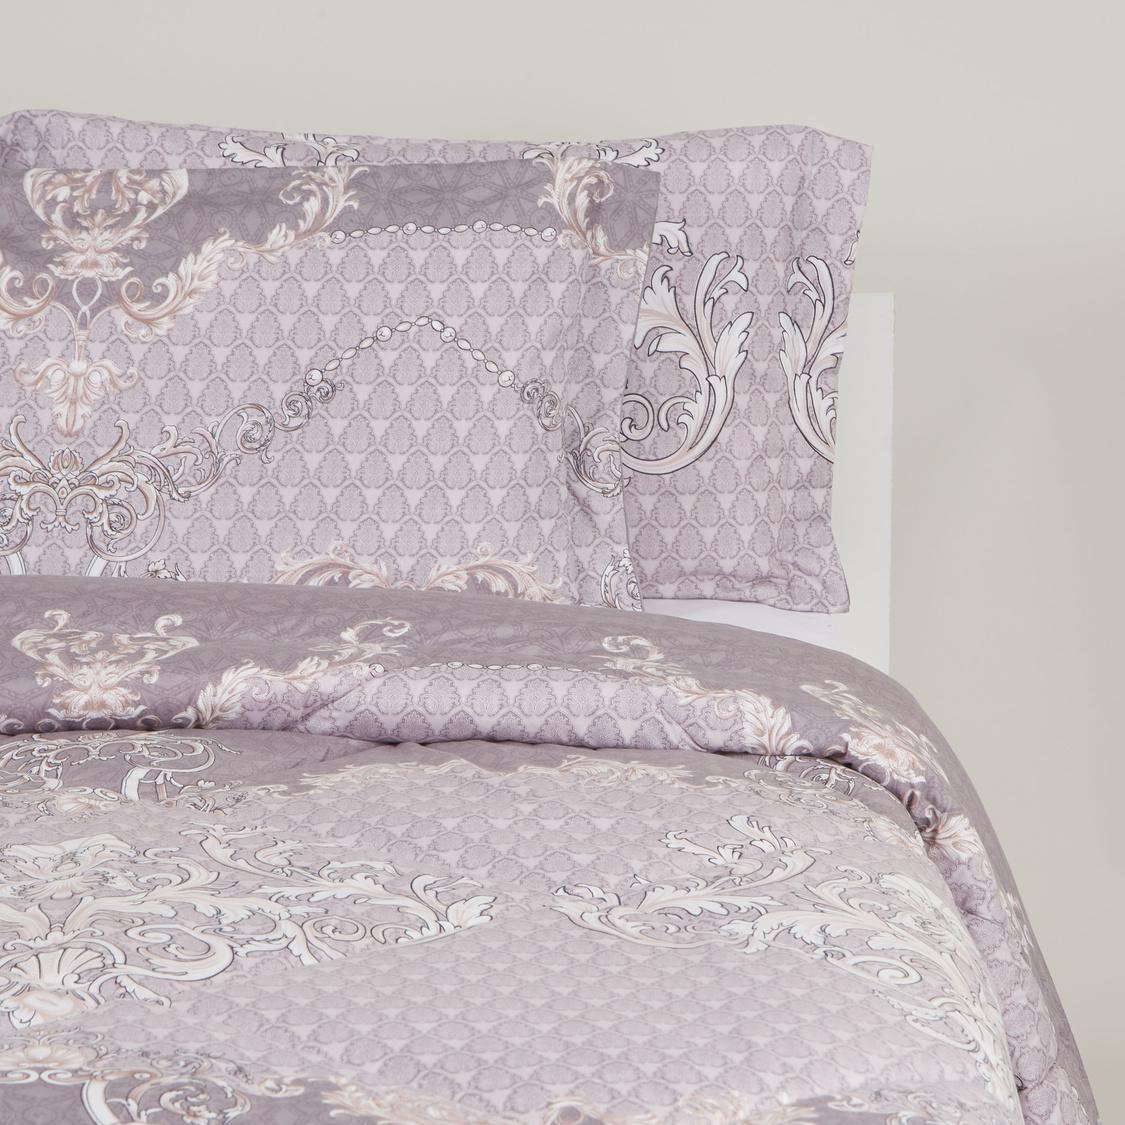 3-Piece King Size Comforter Set - 220x230 cms